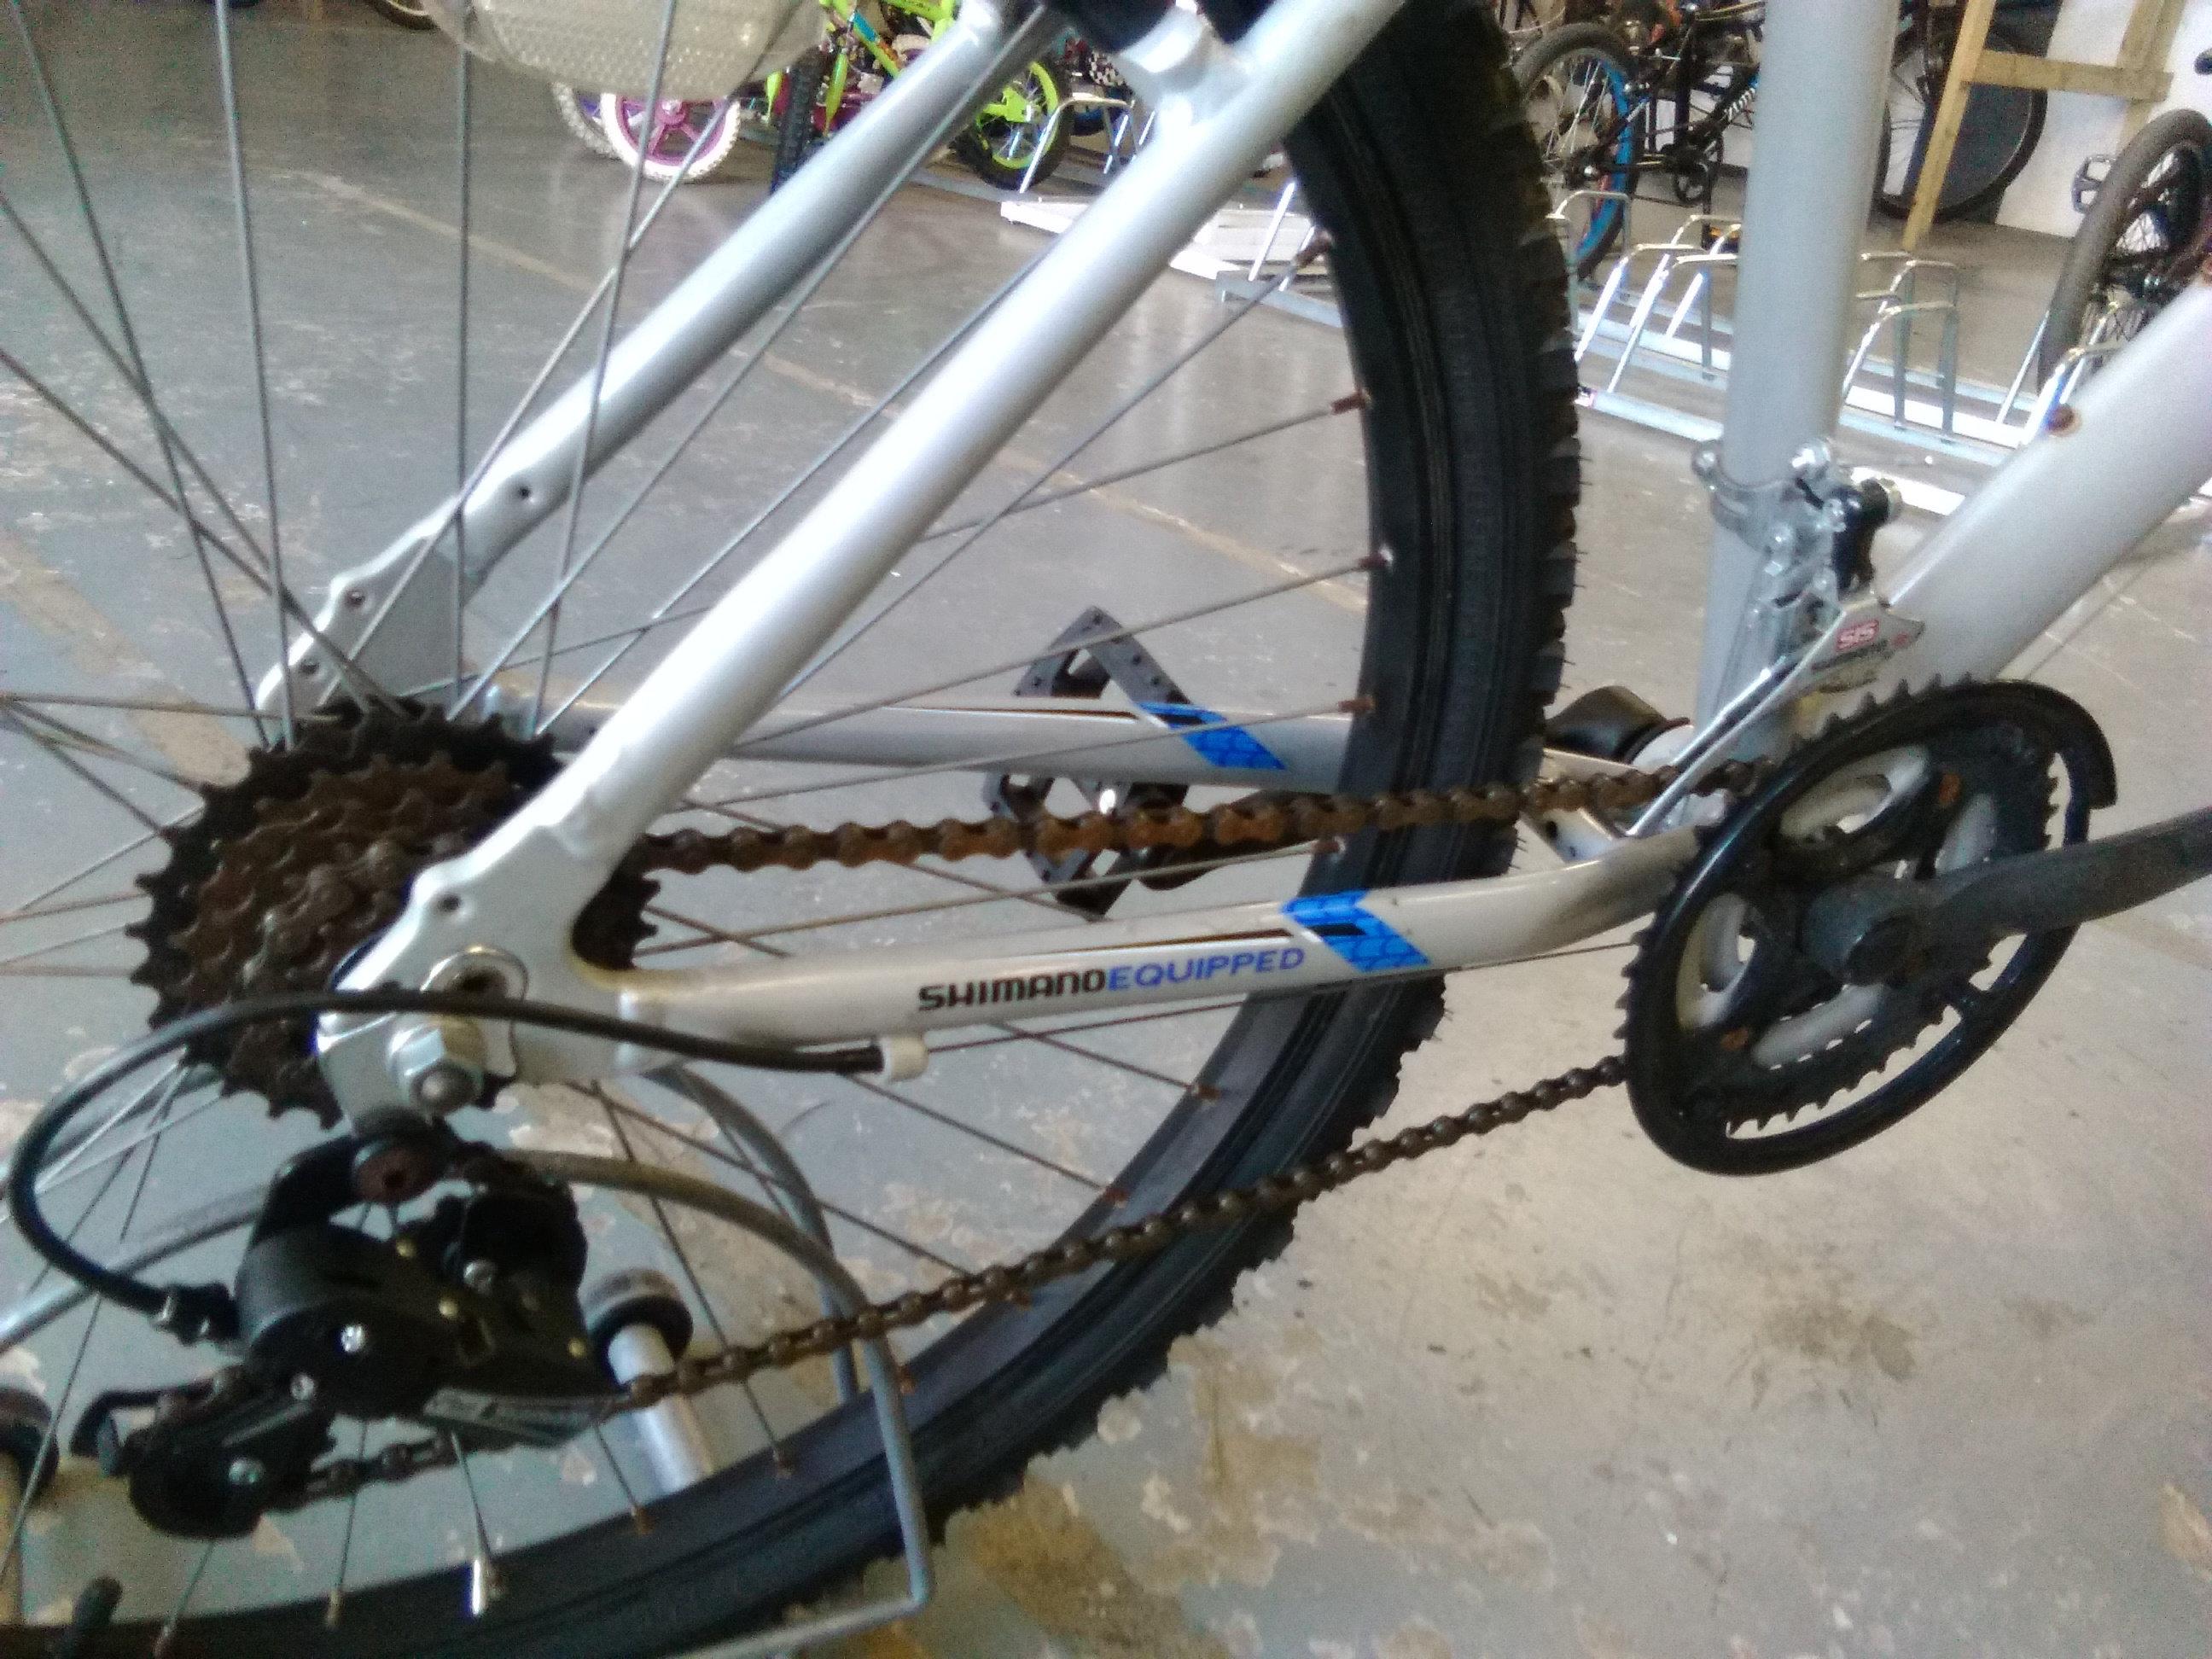 281bd254c APOLLO PHAZE 26 INCH WHEEL FRONT SUS SILVER/BLACK ALLOY 18 SPEED GOOD  CONDITION | castlefordcycles